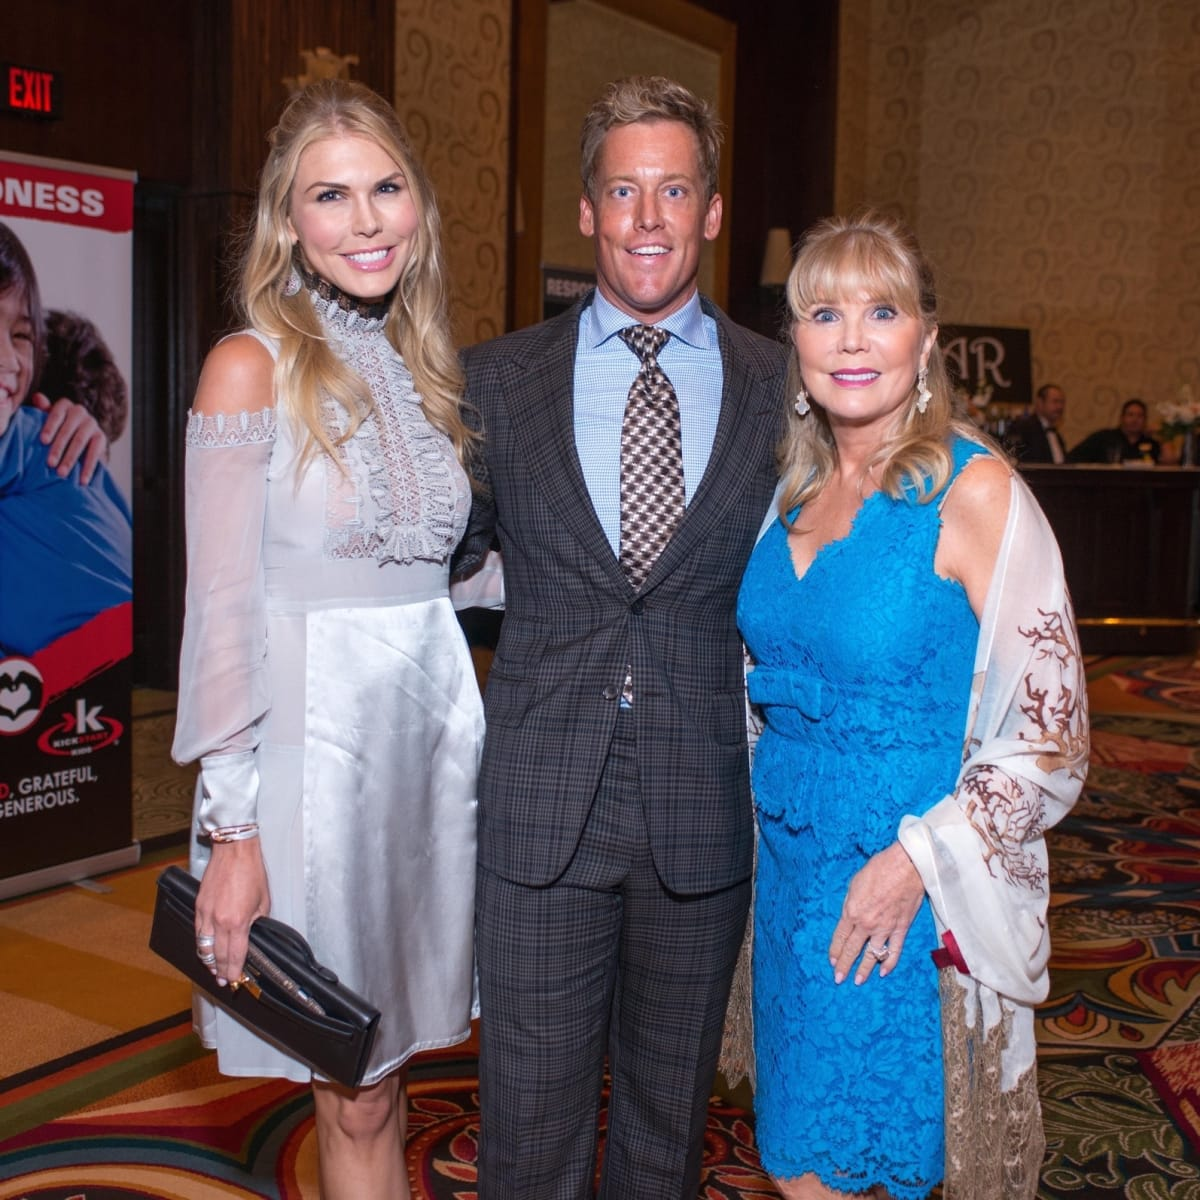 Kickstart gala 5/16, Lindsey Love, Patrick Daniel, Brenda Love